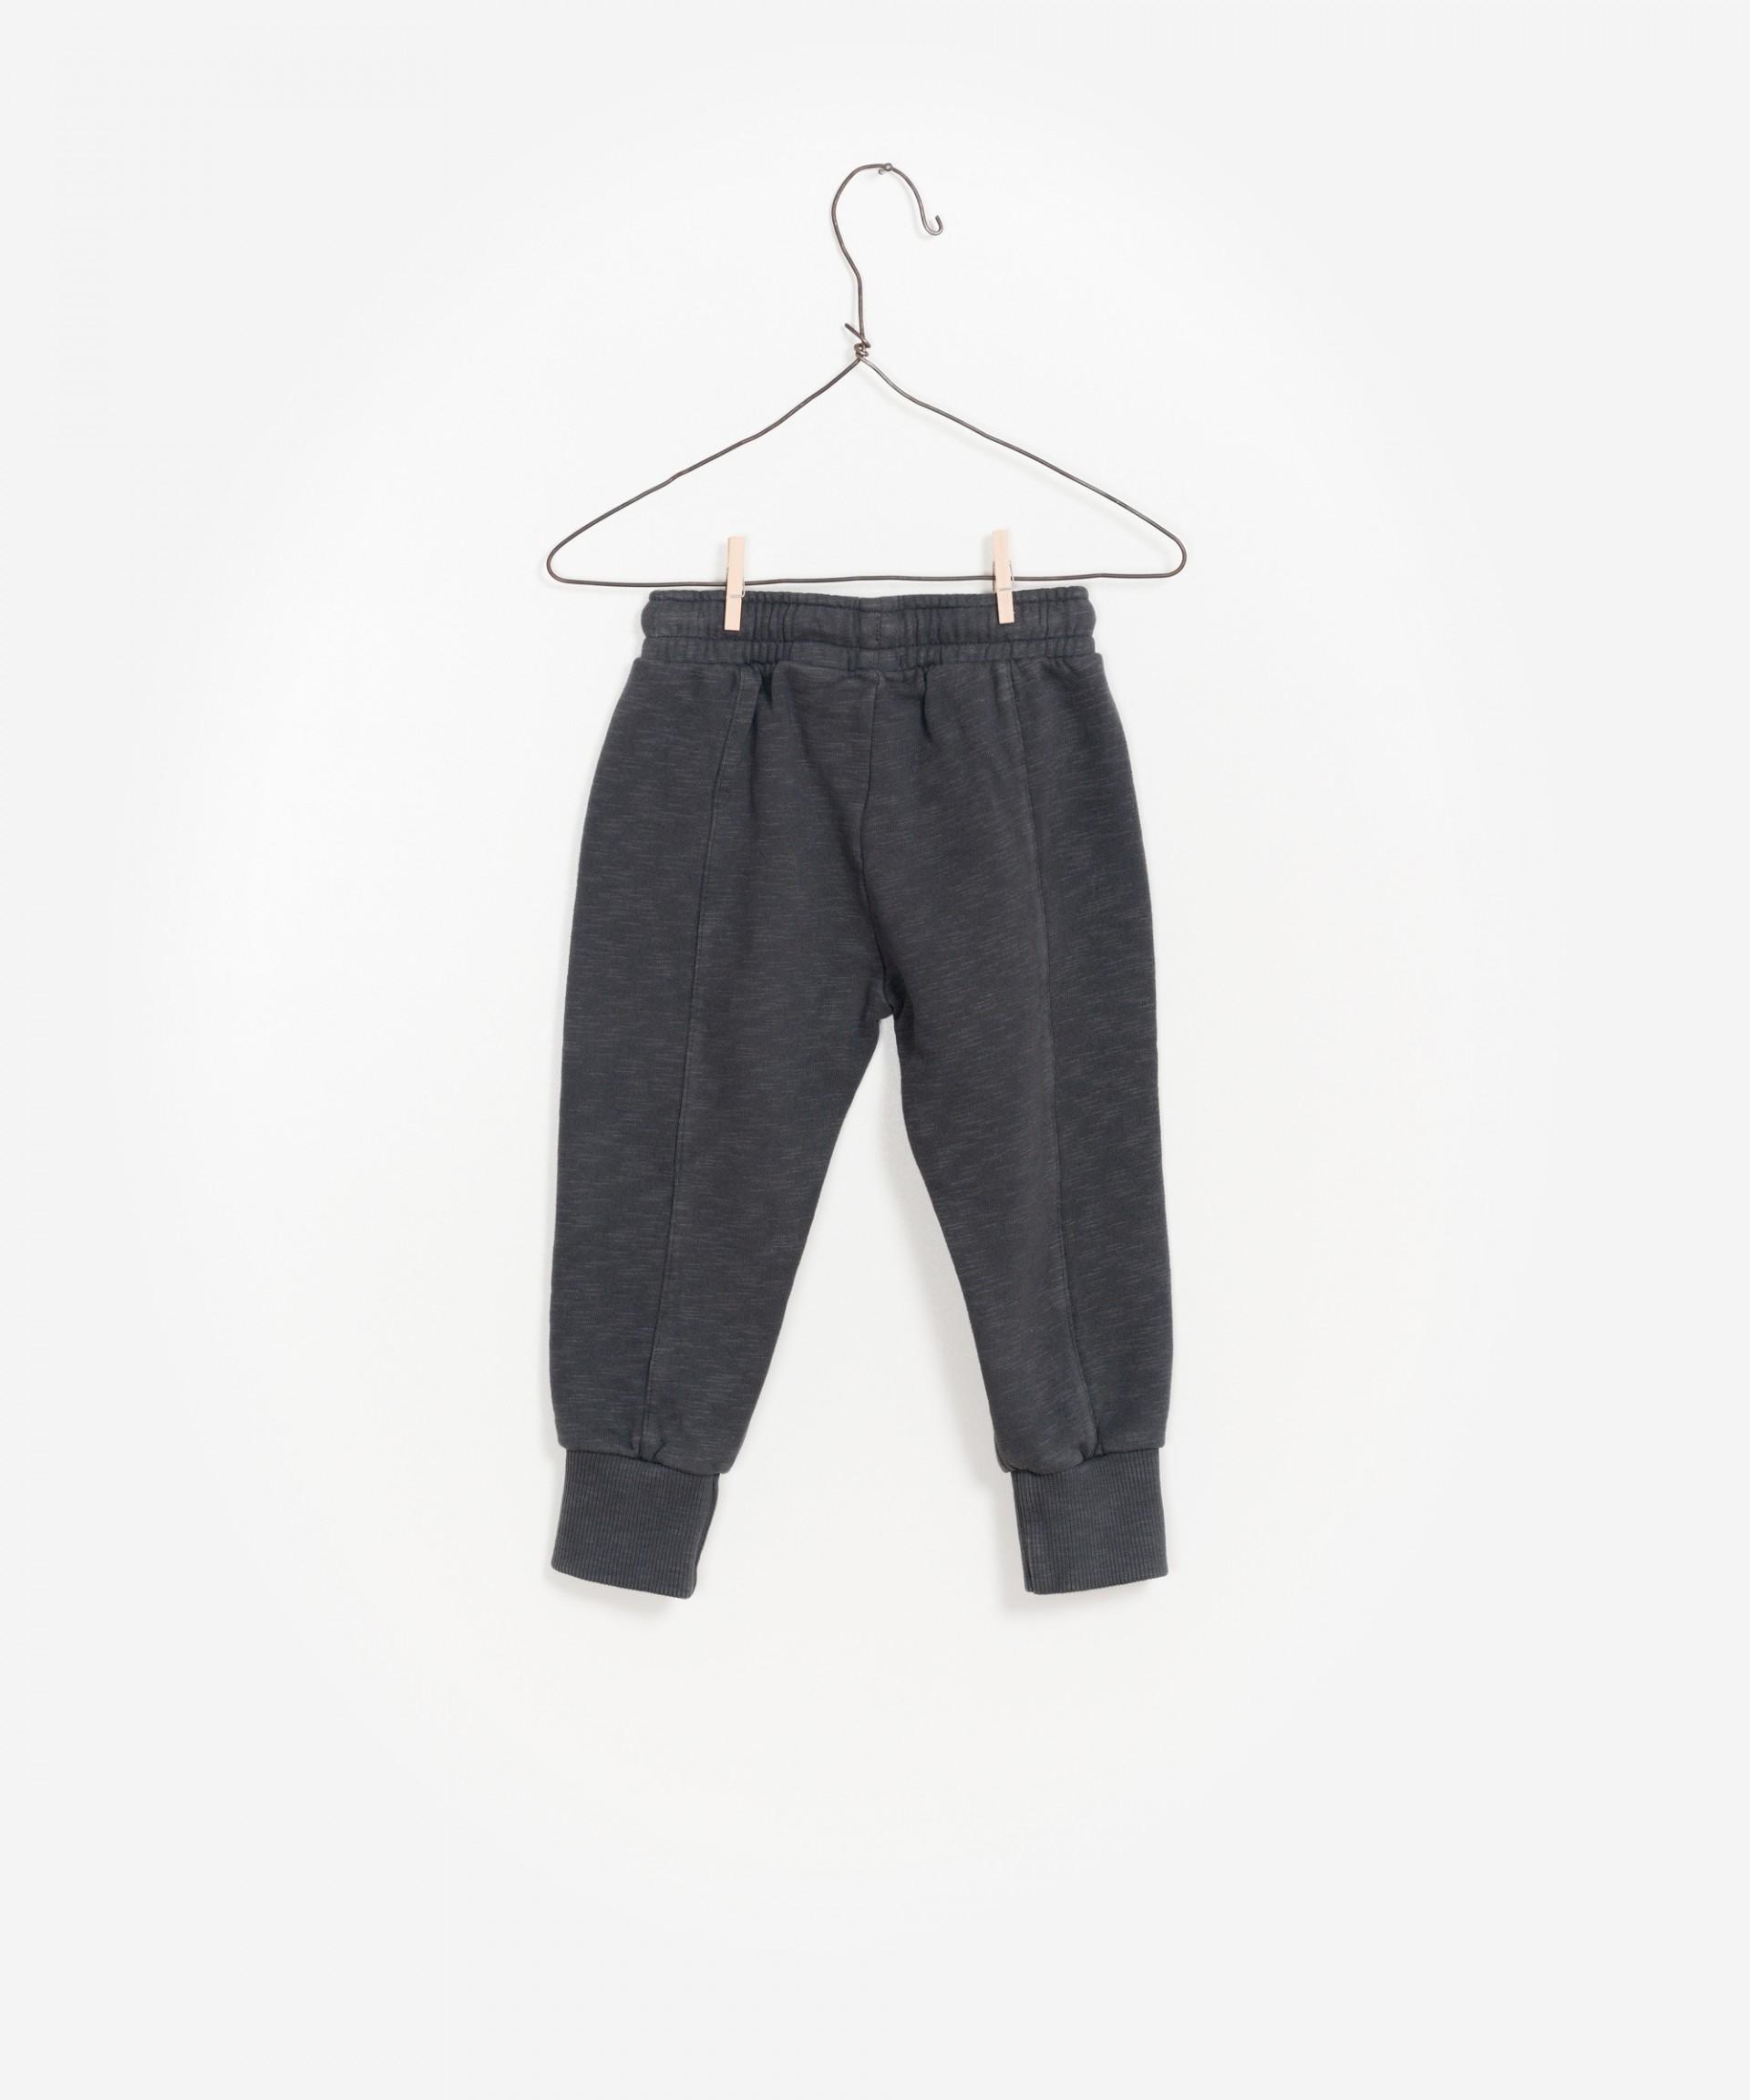 Flamé Fleece Trousers